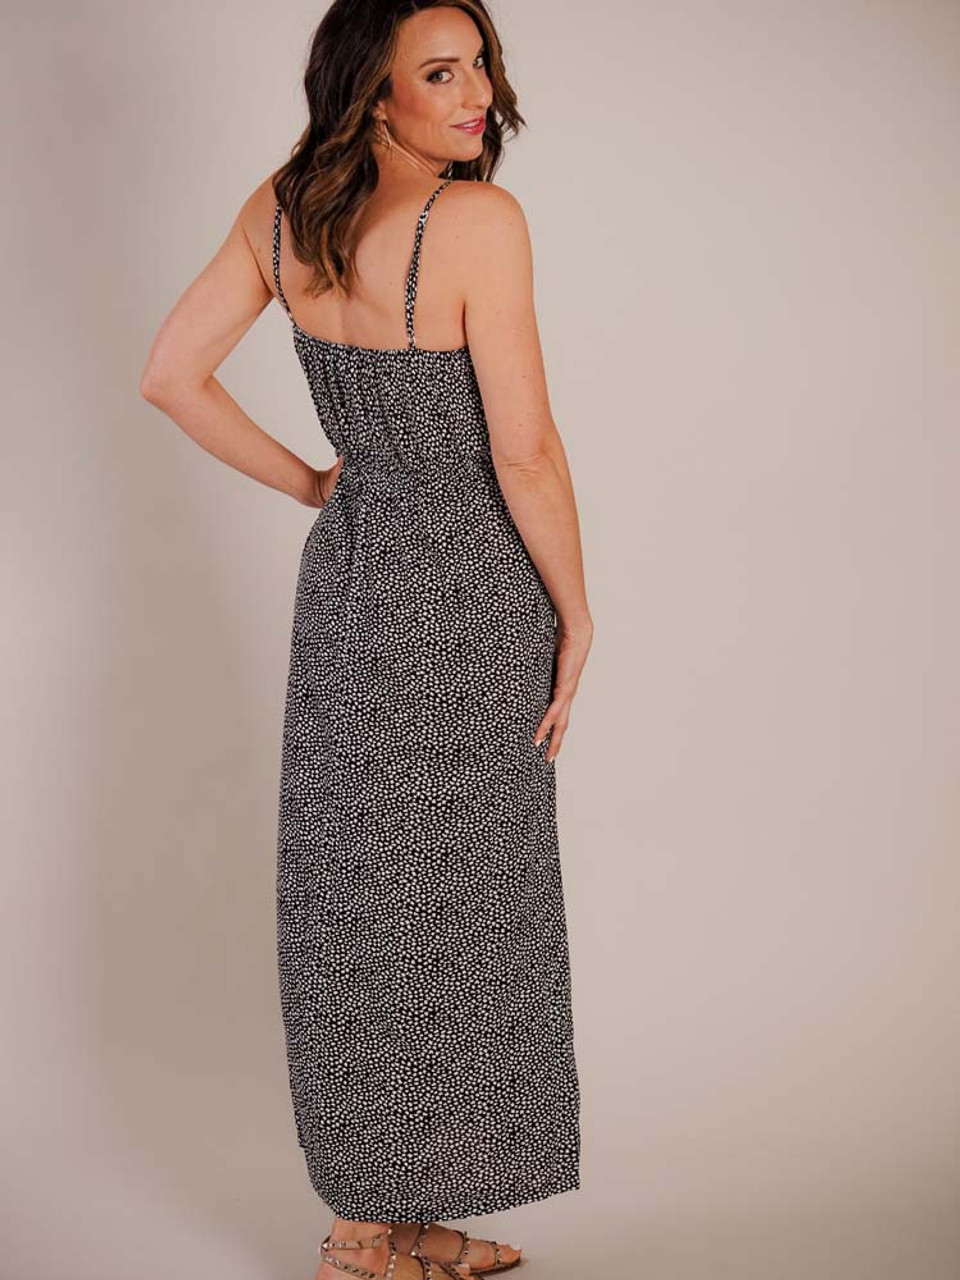 Peek-through lace along v-neck; adjustable straps; elastic across top of back; elastic at waist